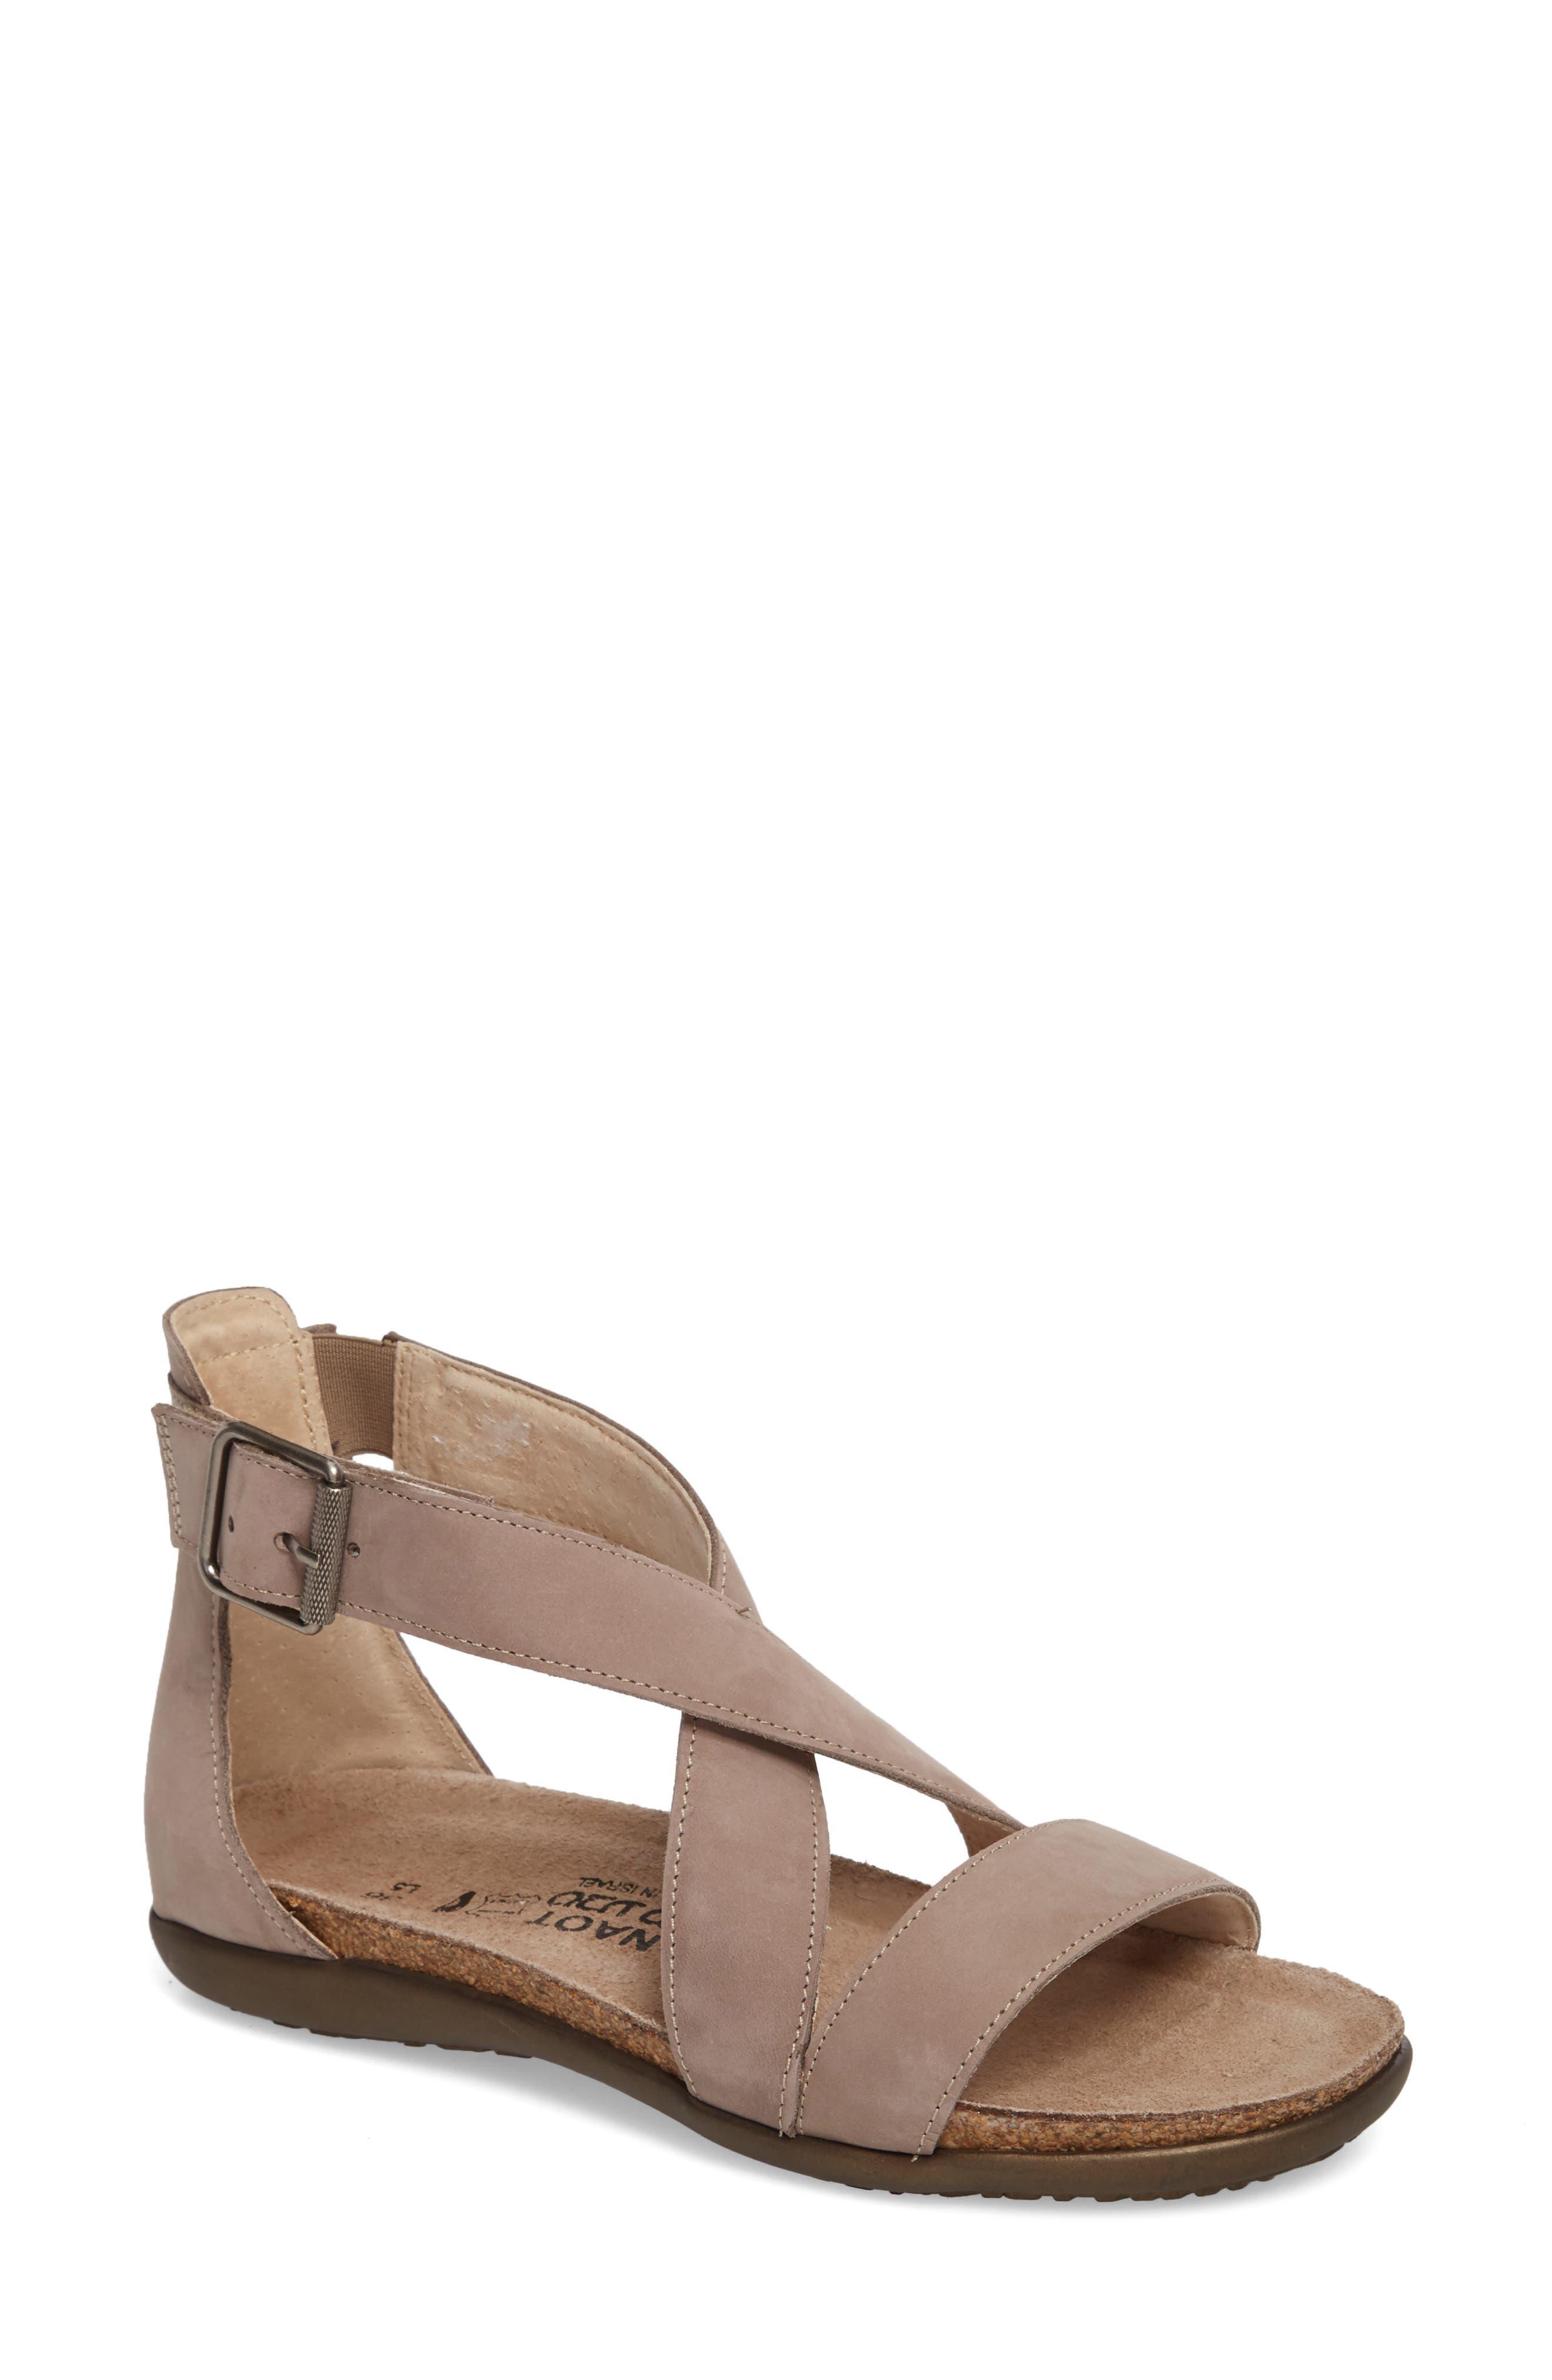 NAOT Rianna Crisscross Sandal, Main, color, STONE NUBUCK